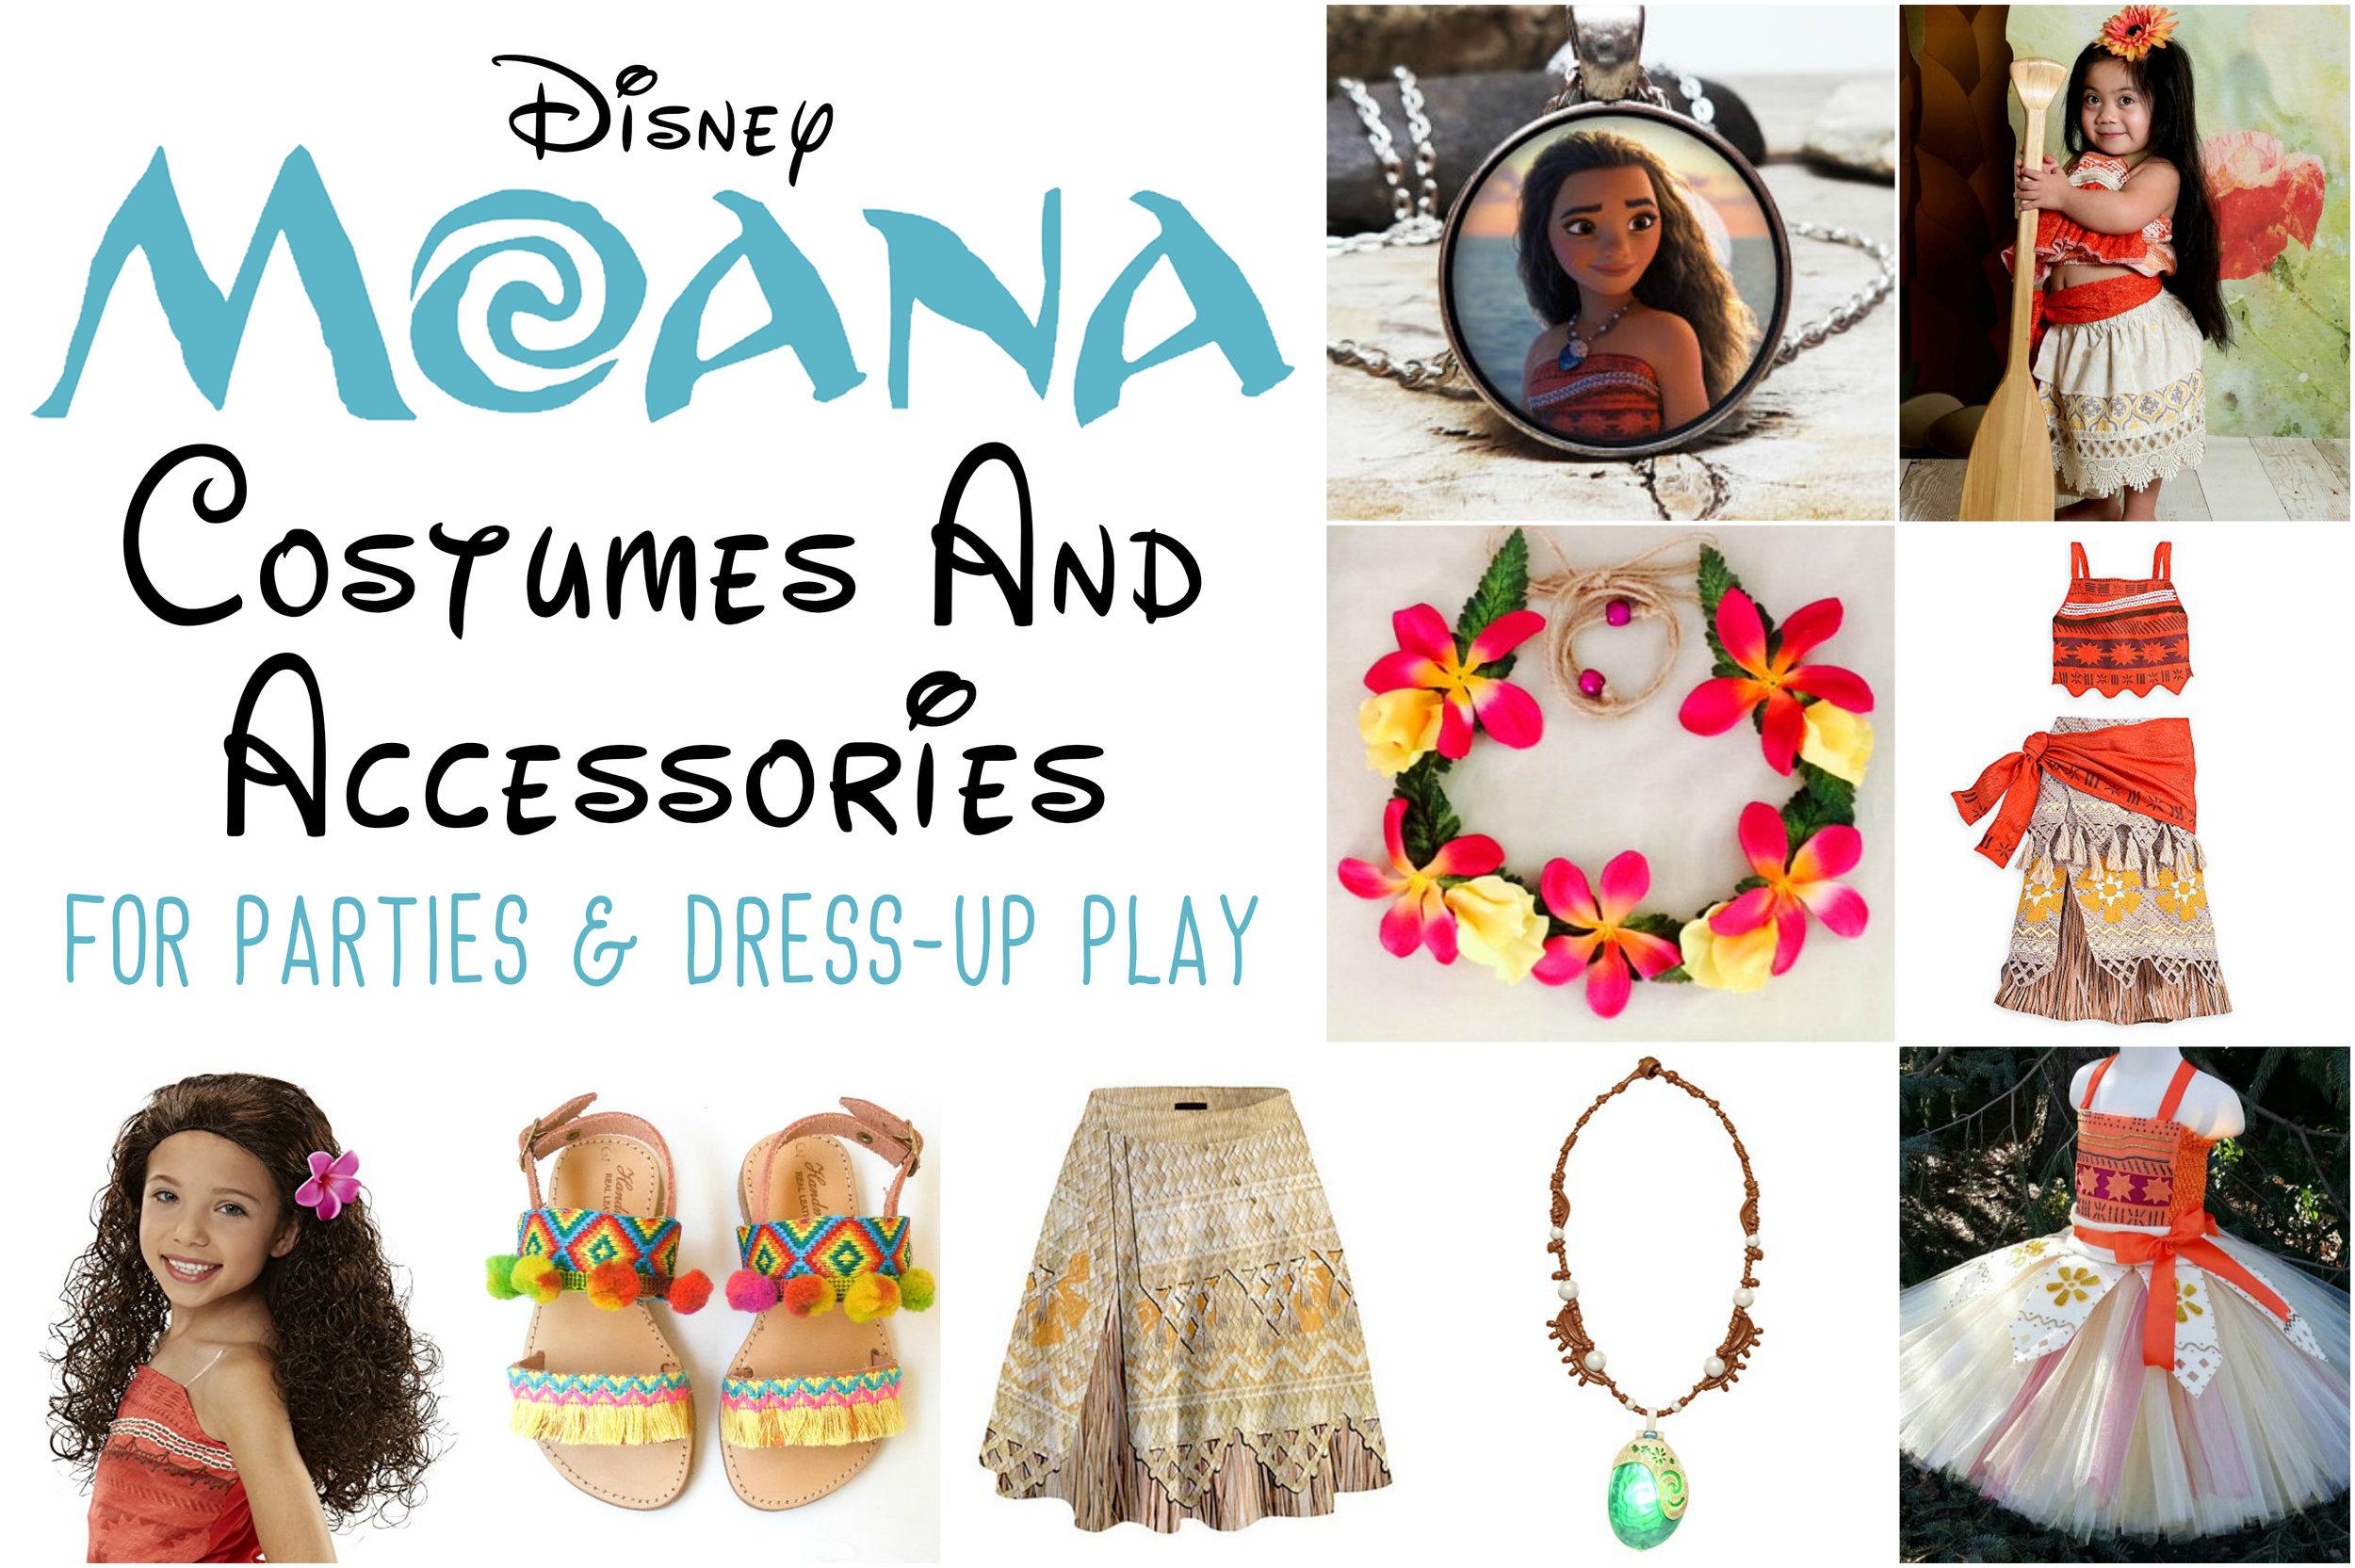 Disney Moana Princess Costume for Kids